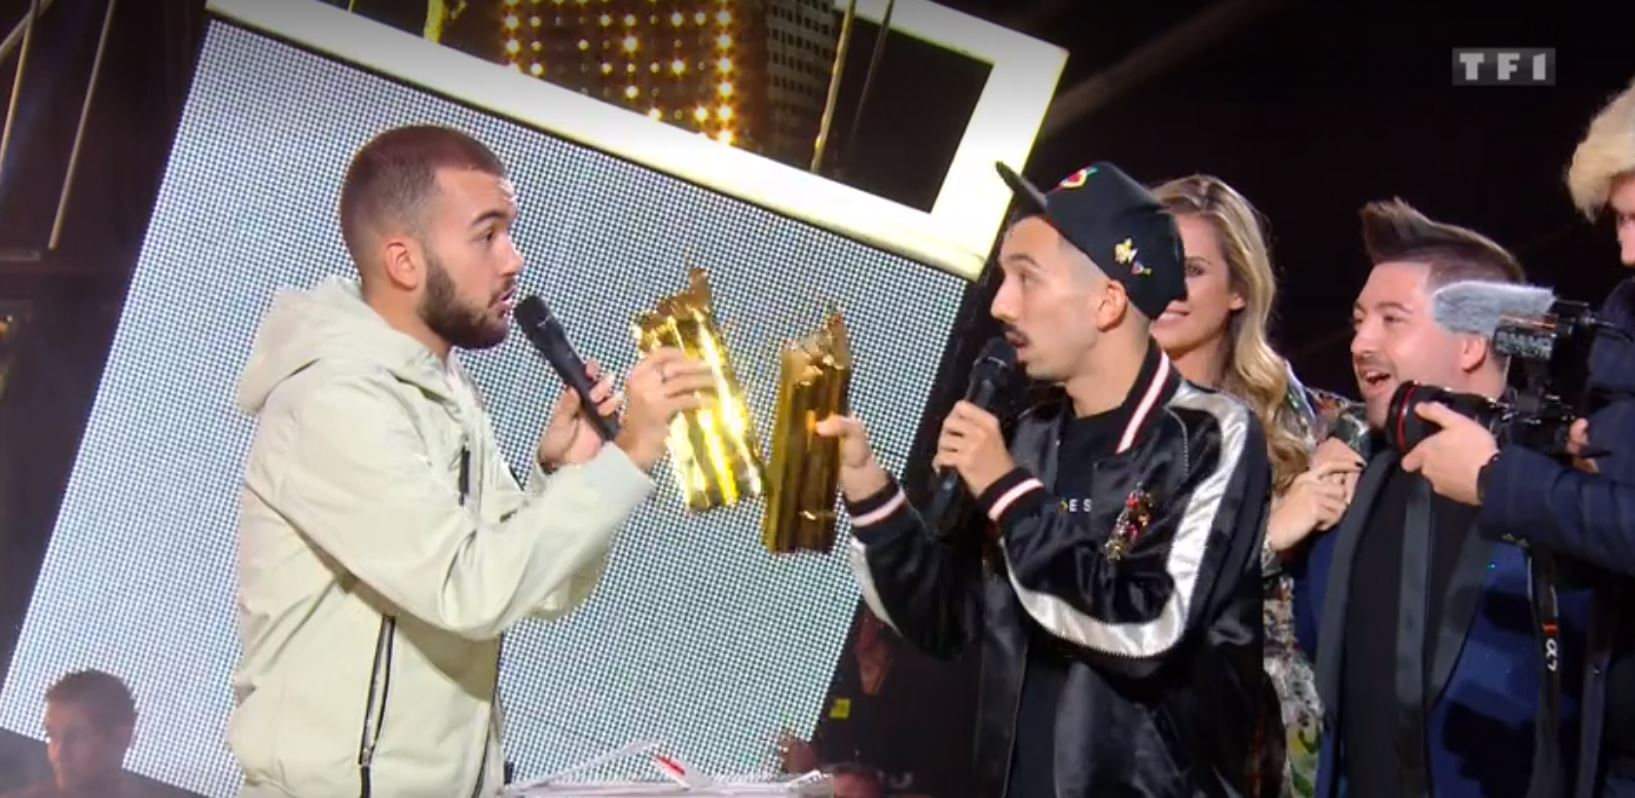 NRJ Music Awards 2019 - NMA 2019 - Big Flo & Oli - trophées